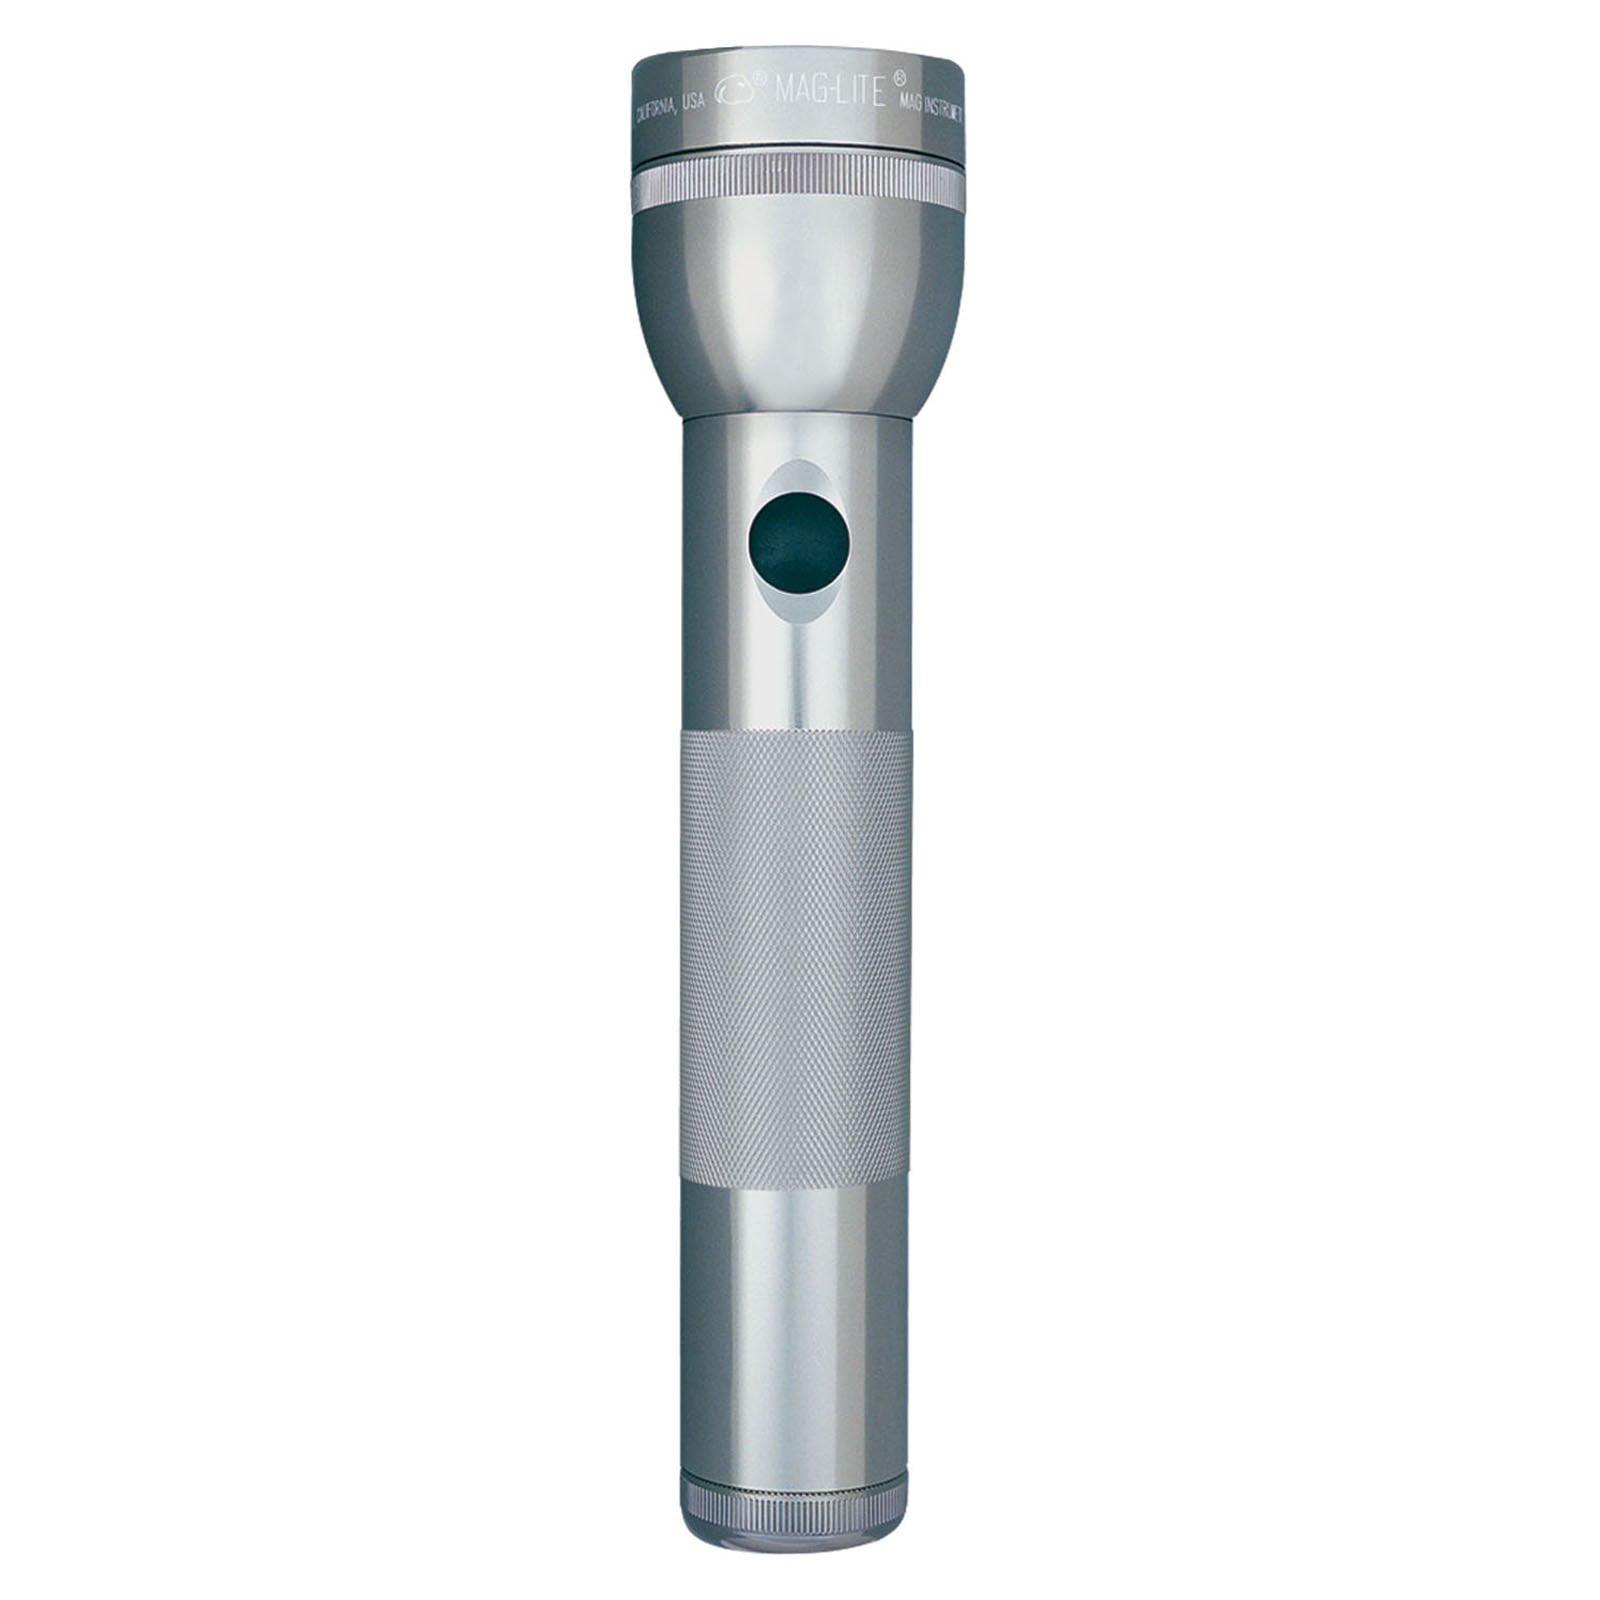 MagLite LED ST2D0 Flashlight